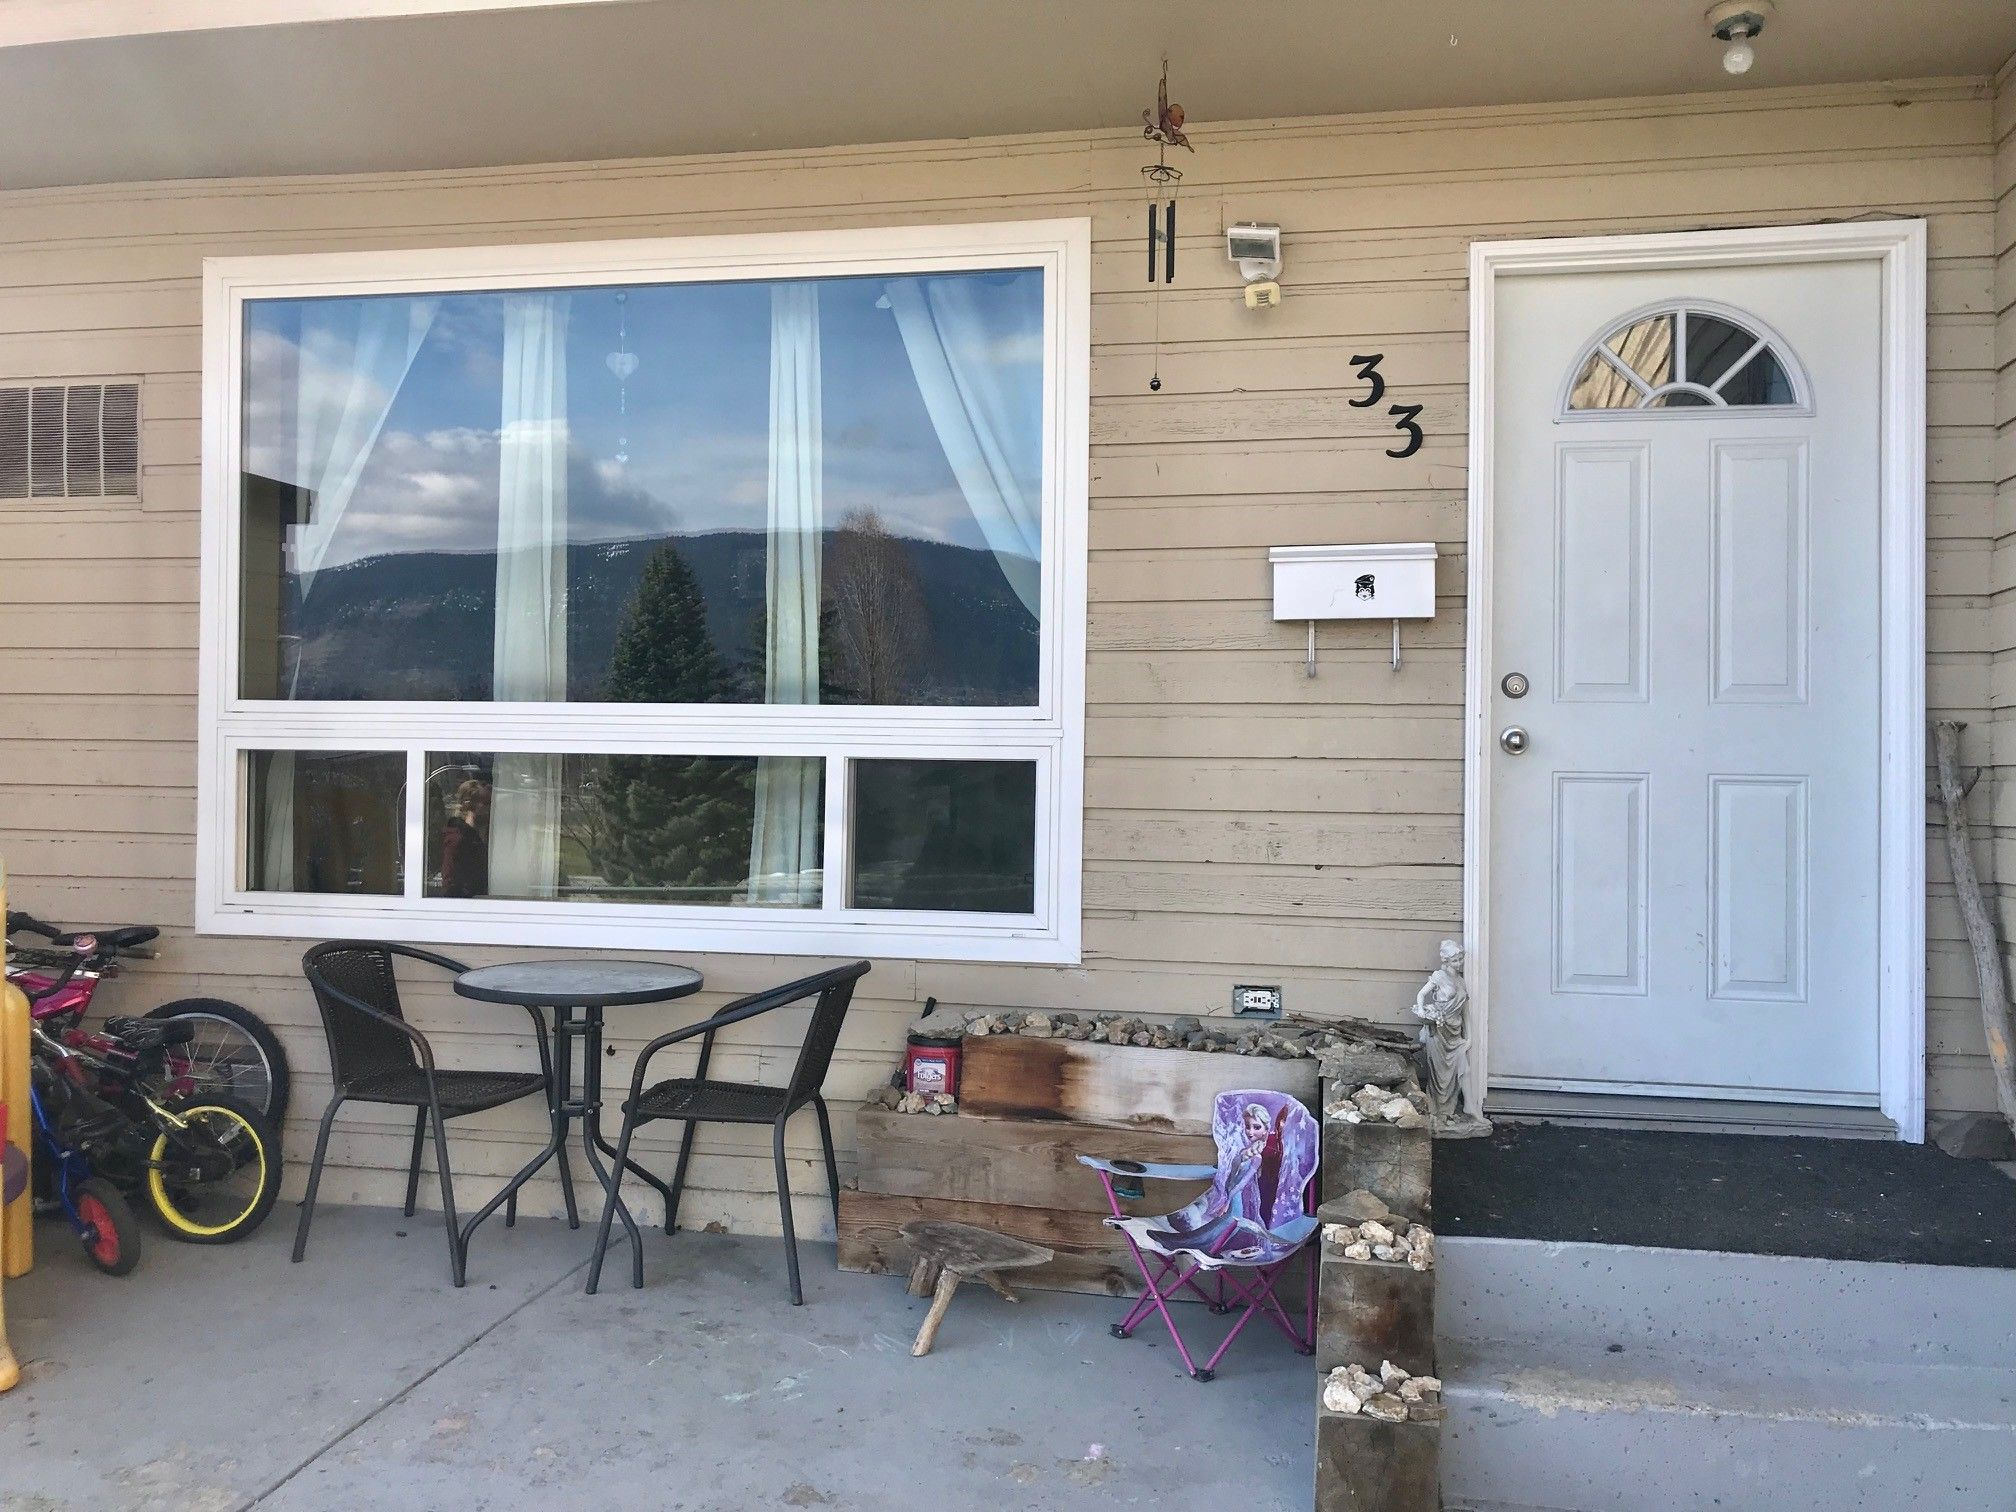 Main Photo: 33 3800 40th Avenue in Vernon: Alexis Park House for sale (North Okanagan)  : MLS®# 10154968